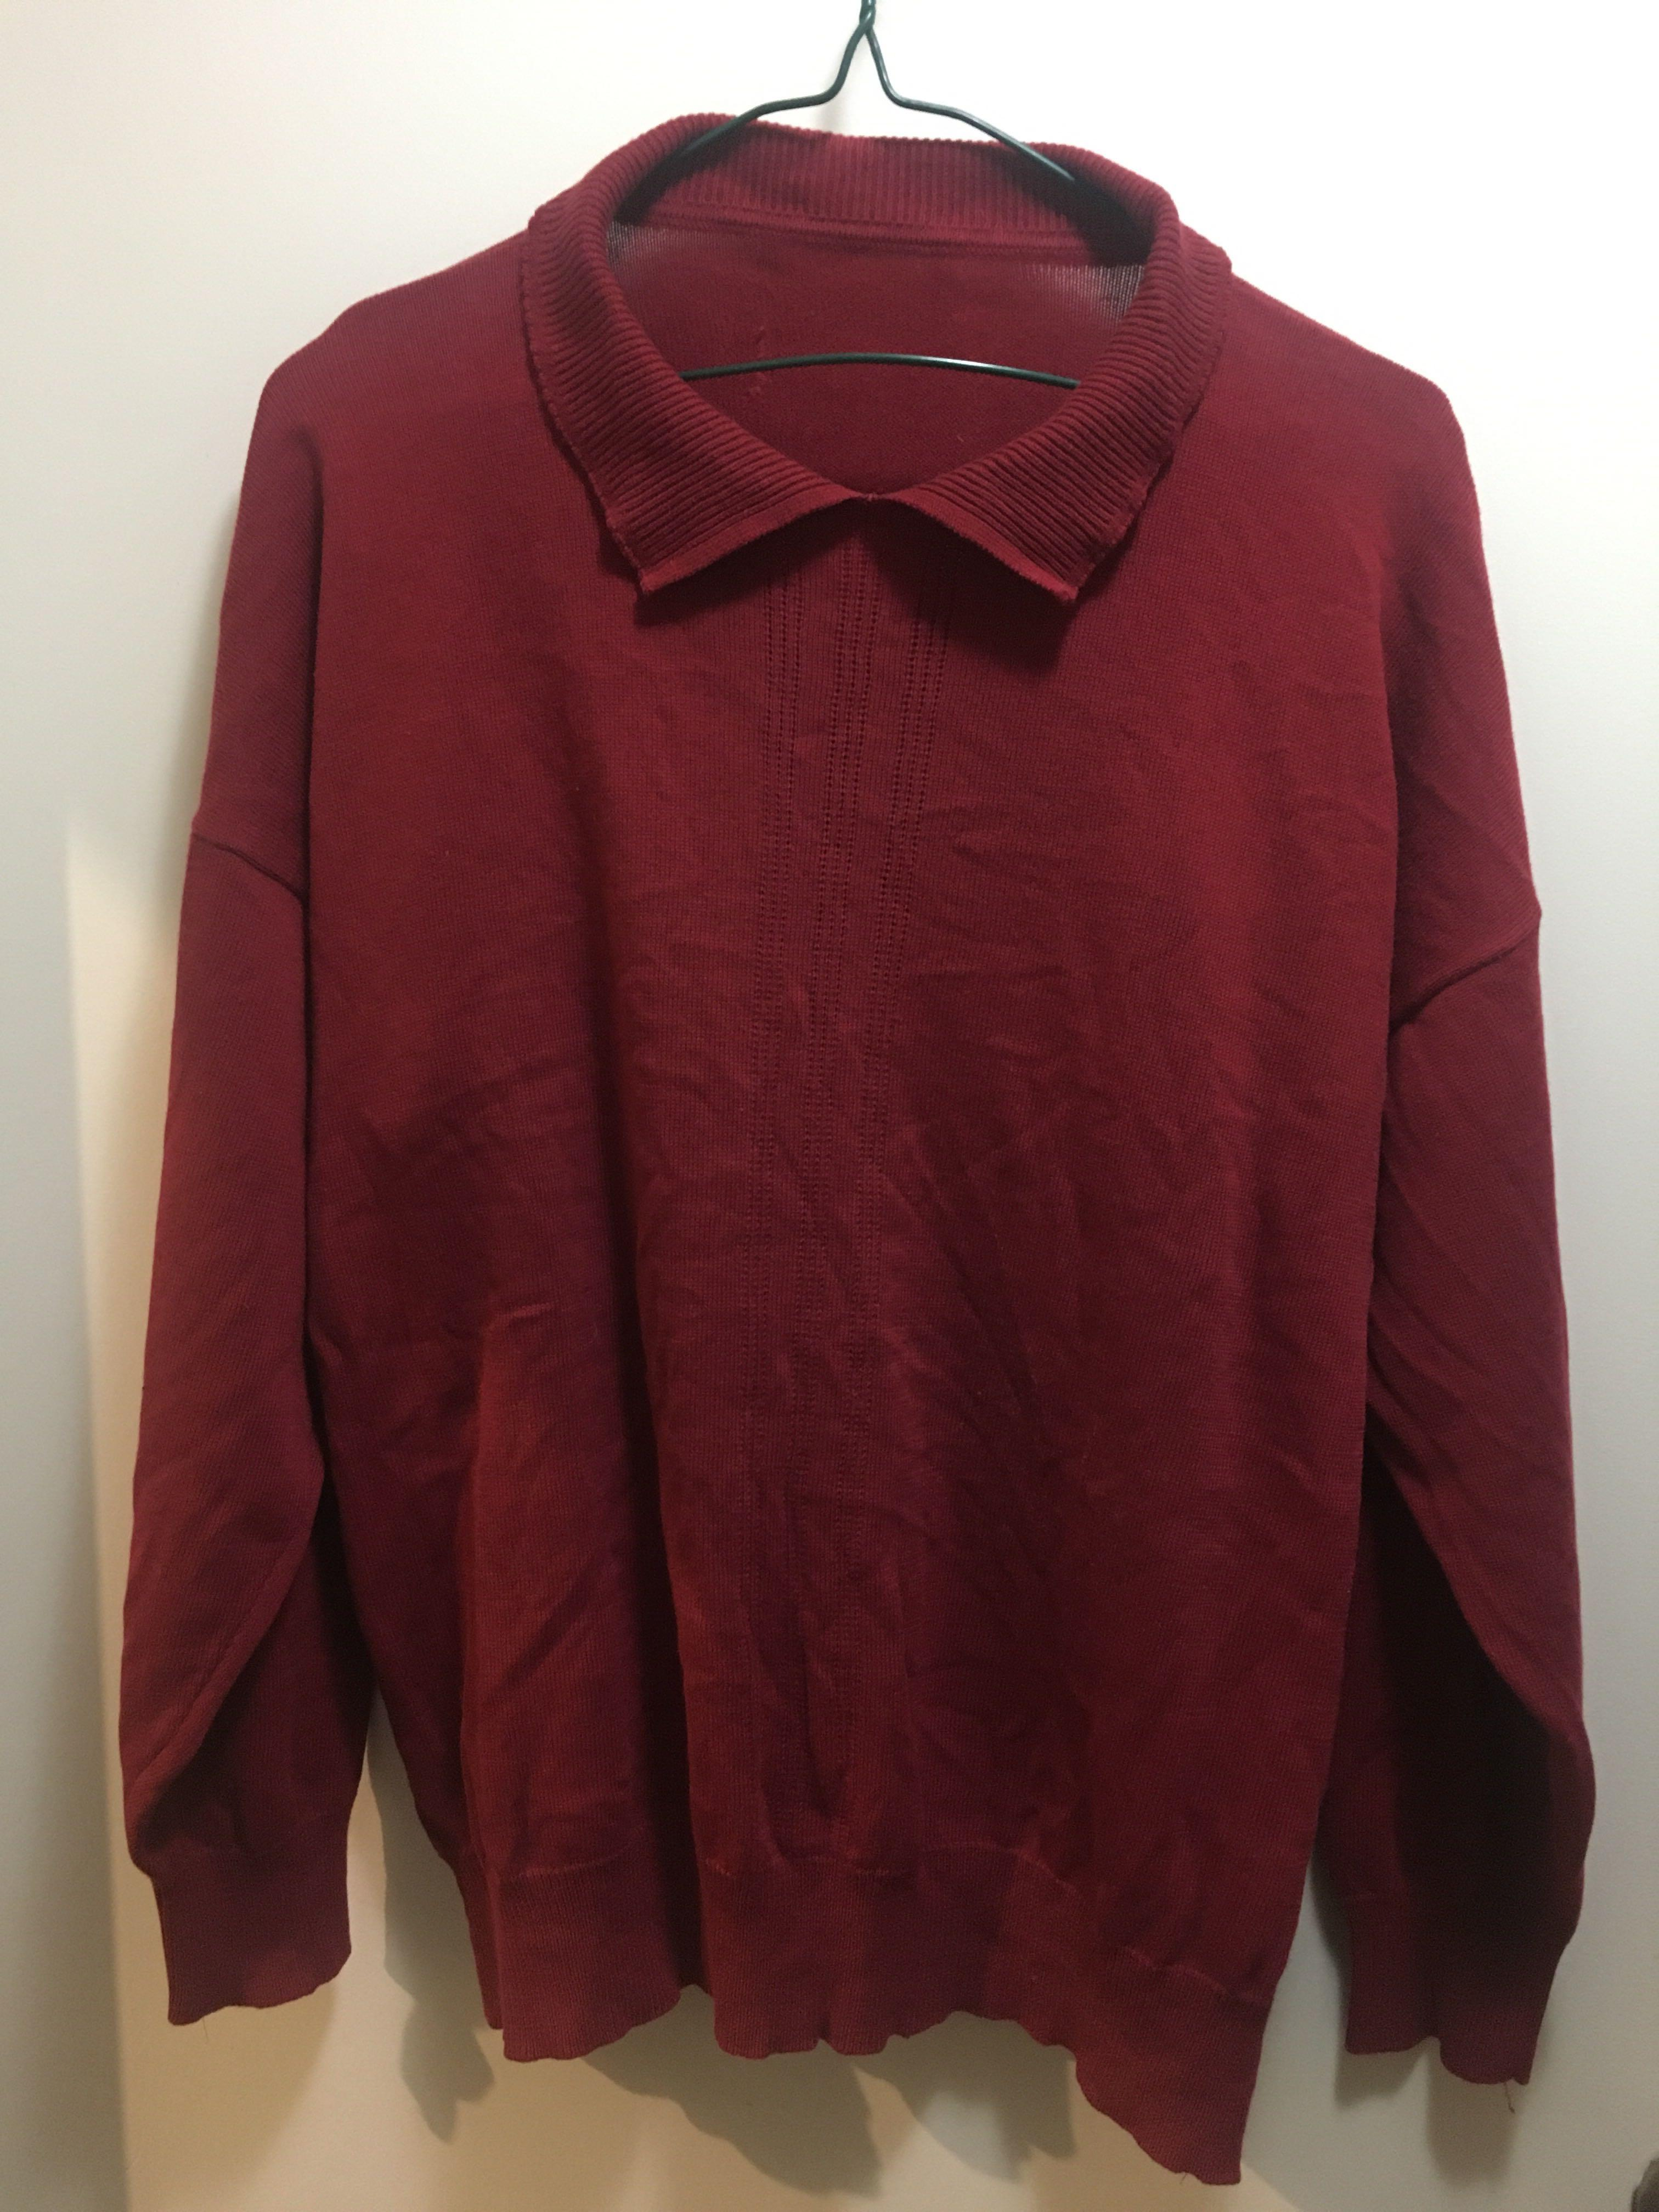 Maroon collared knit jumper